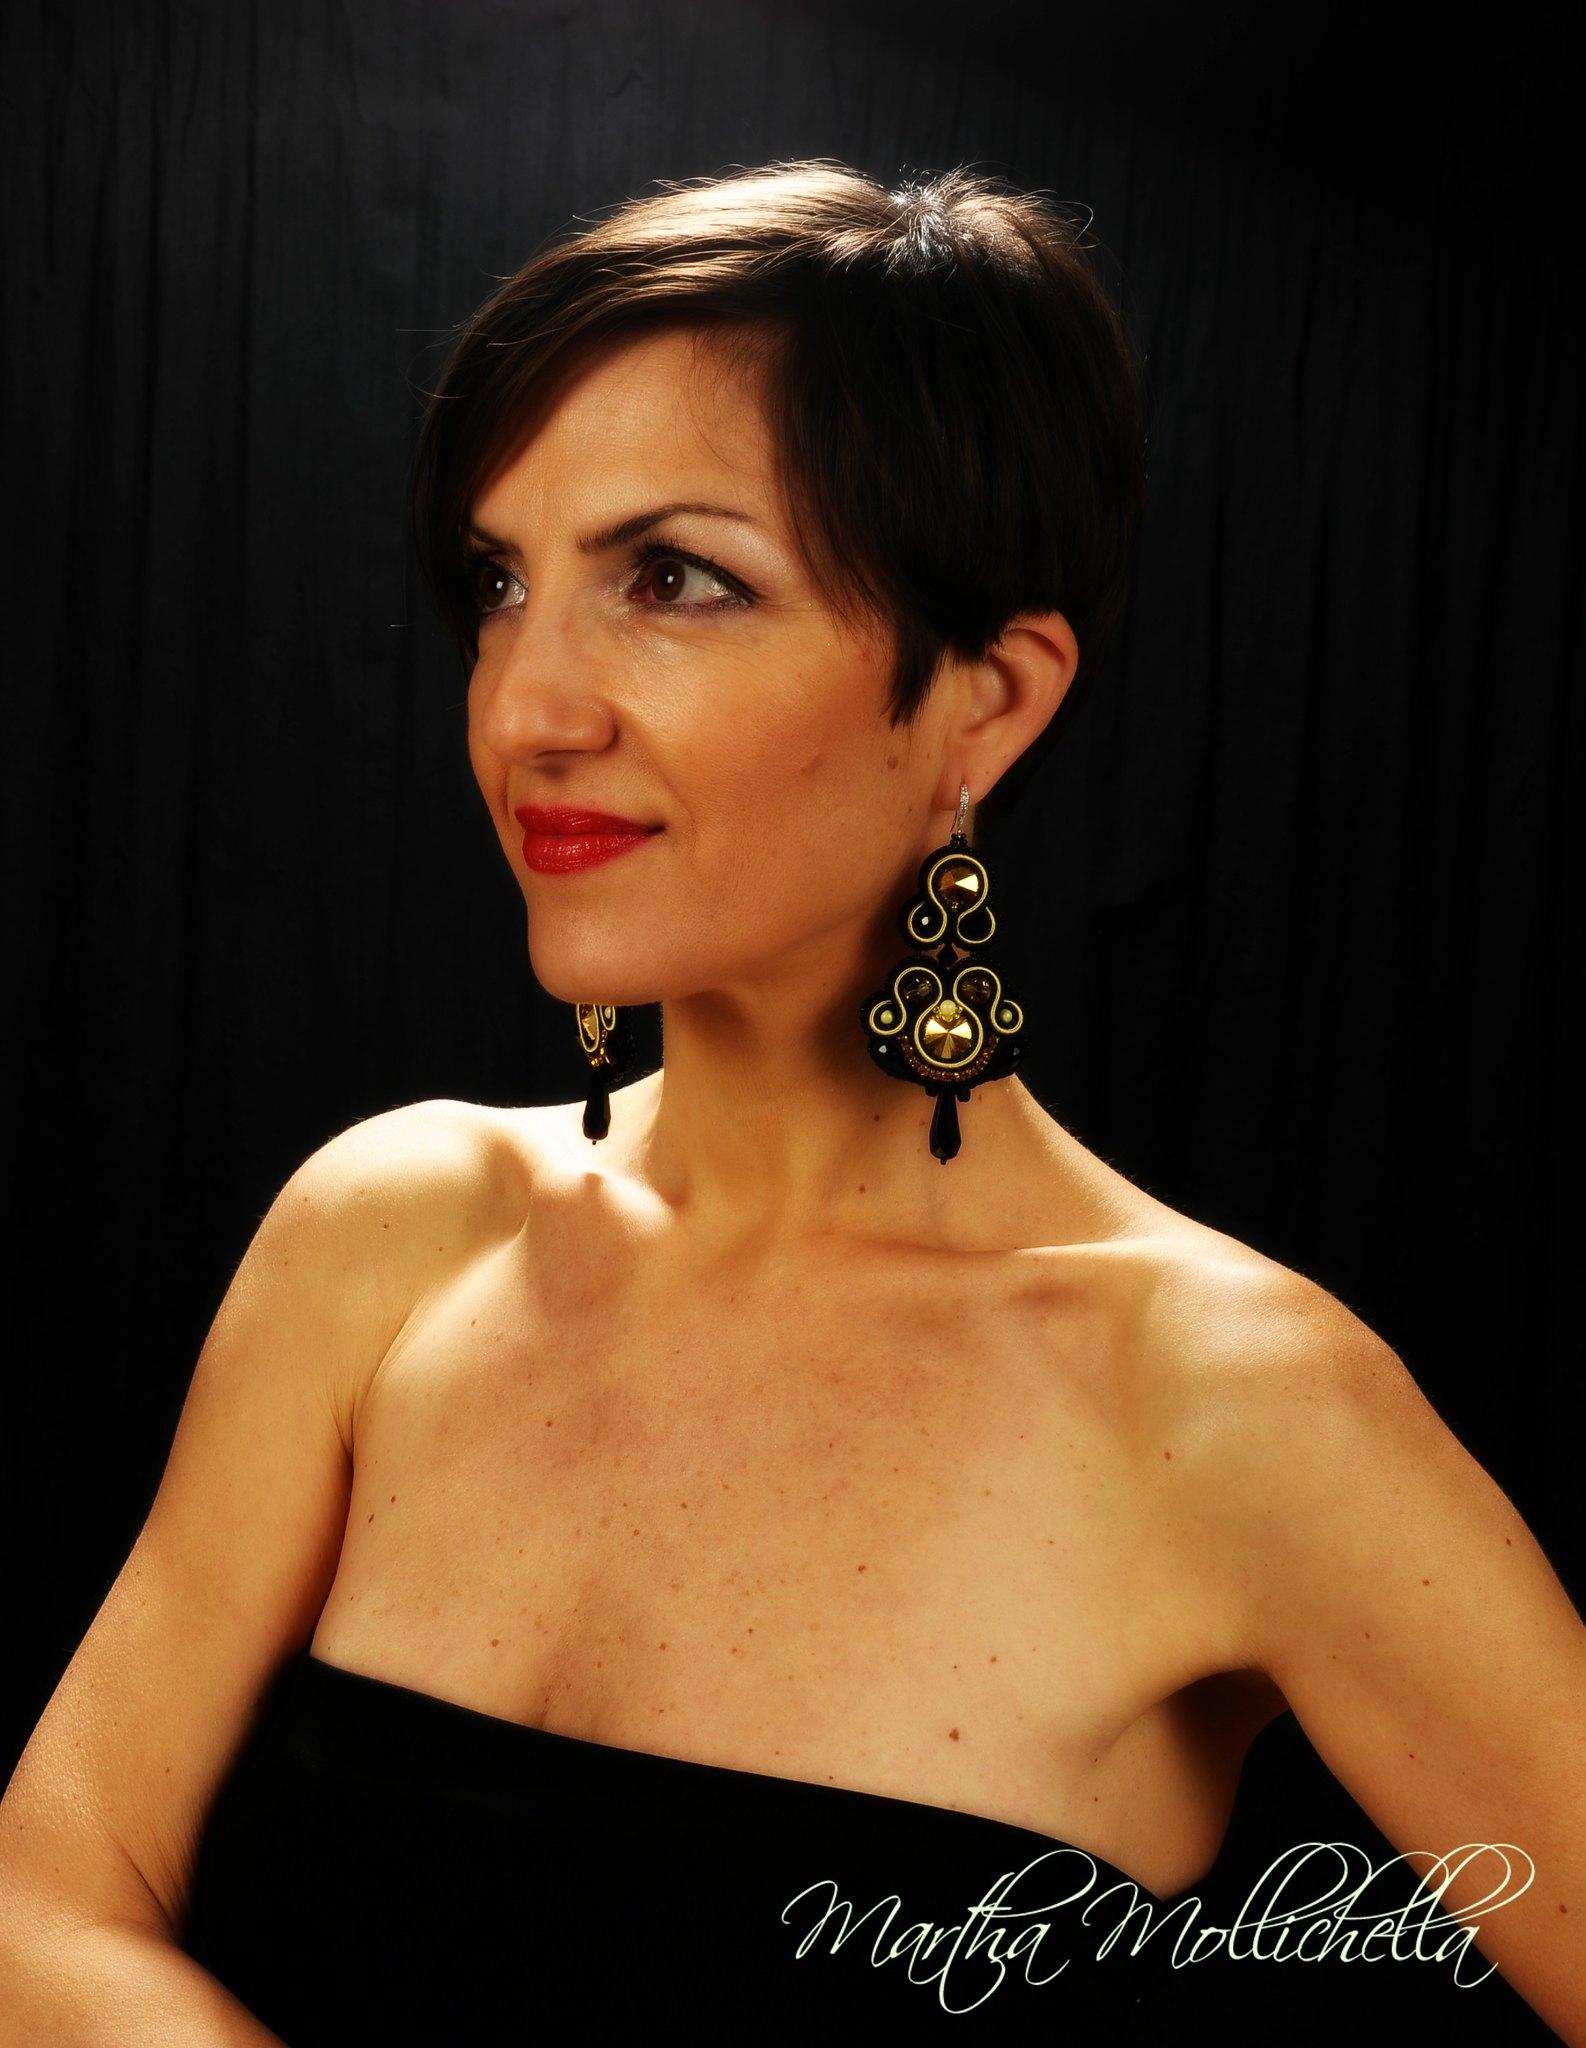 soutache earrings with swarovski crystal handmade in Italy by Martha Mollichella